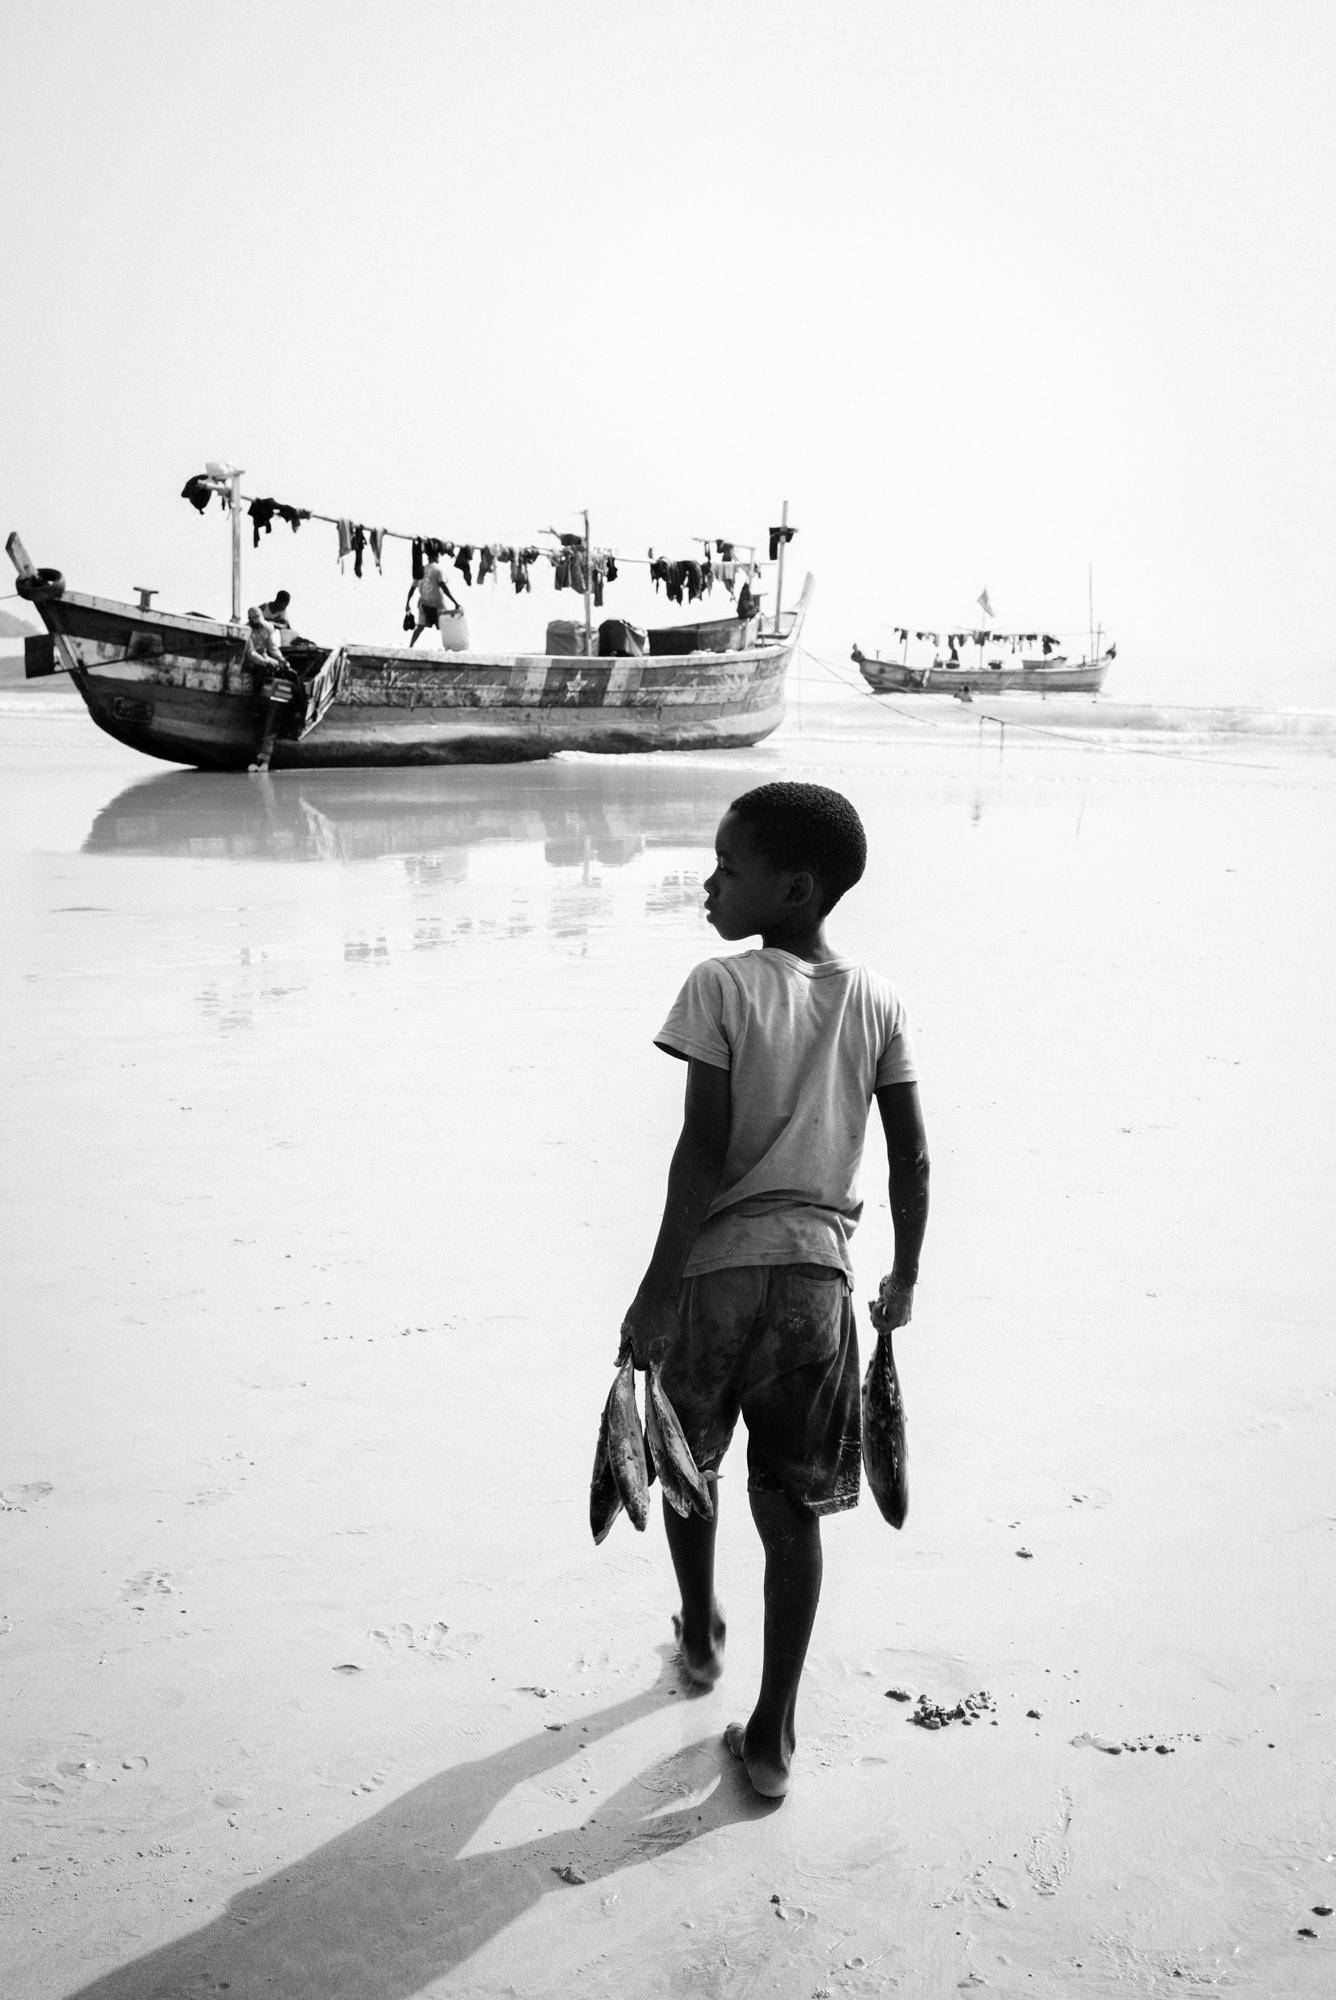 Boy with fish, Ghana 2018